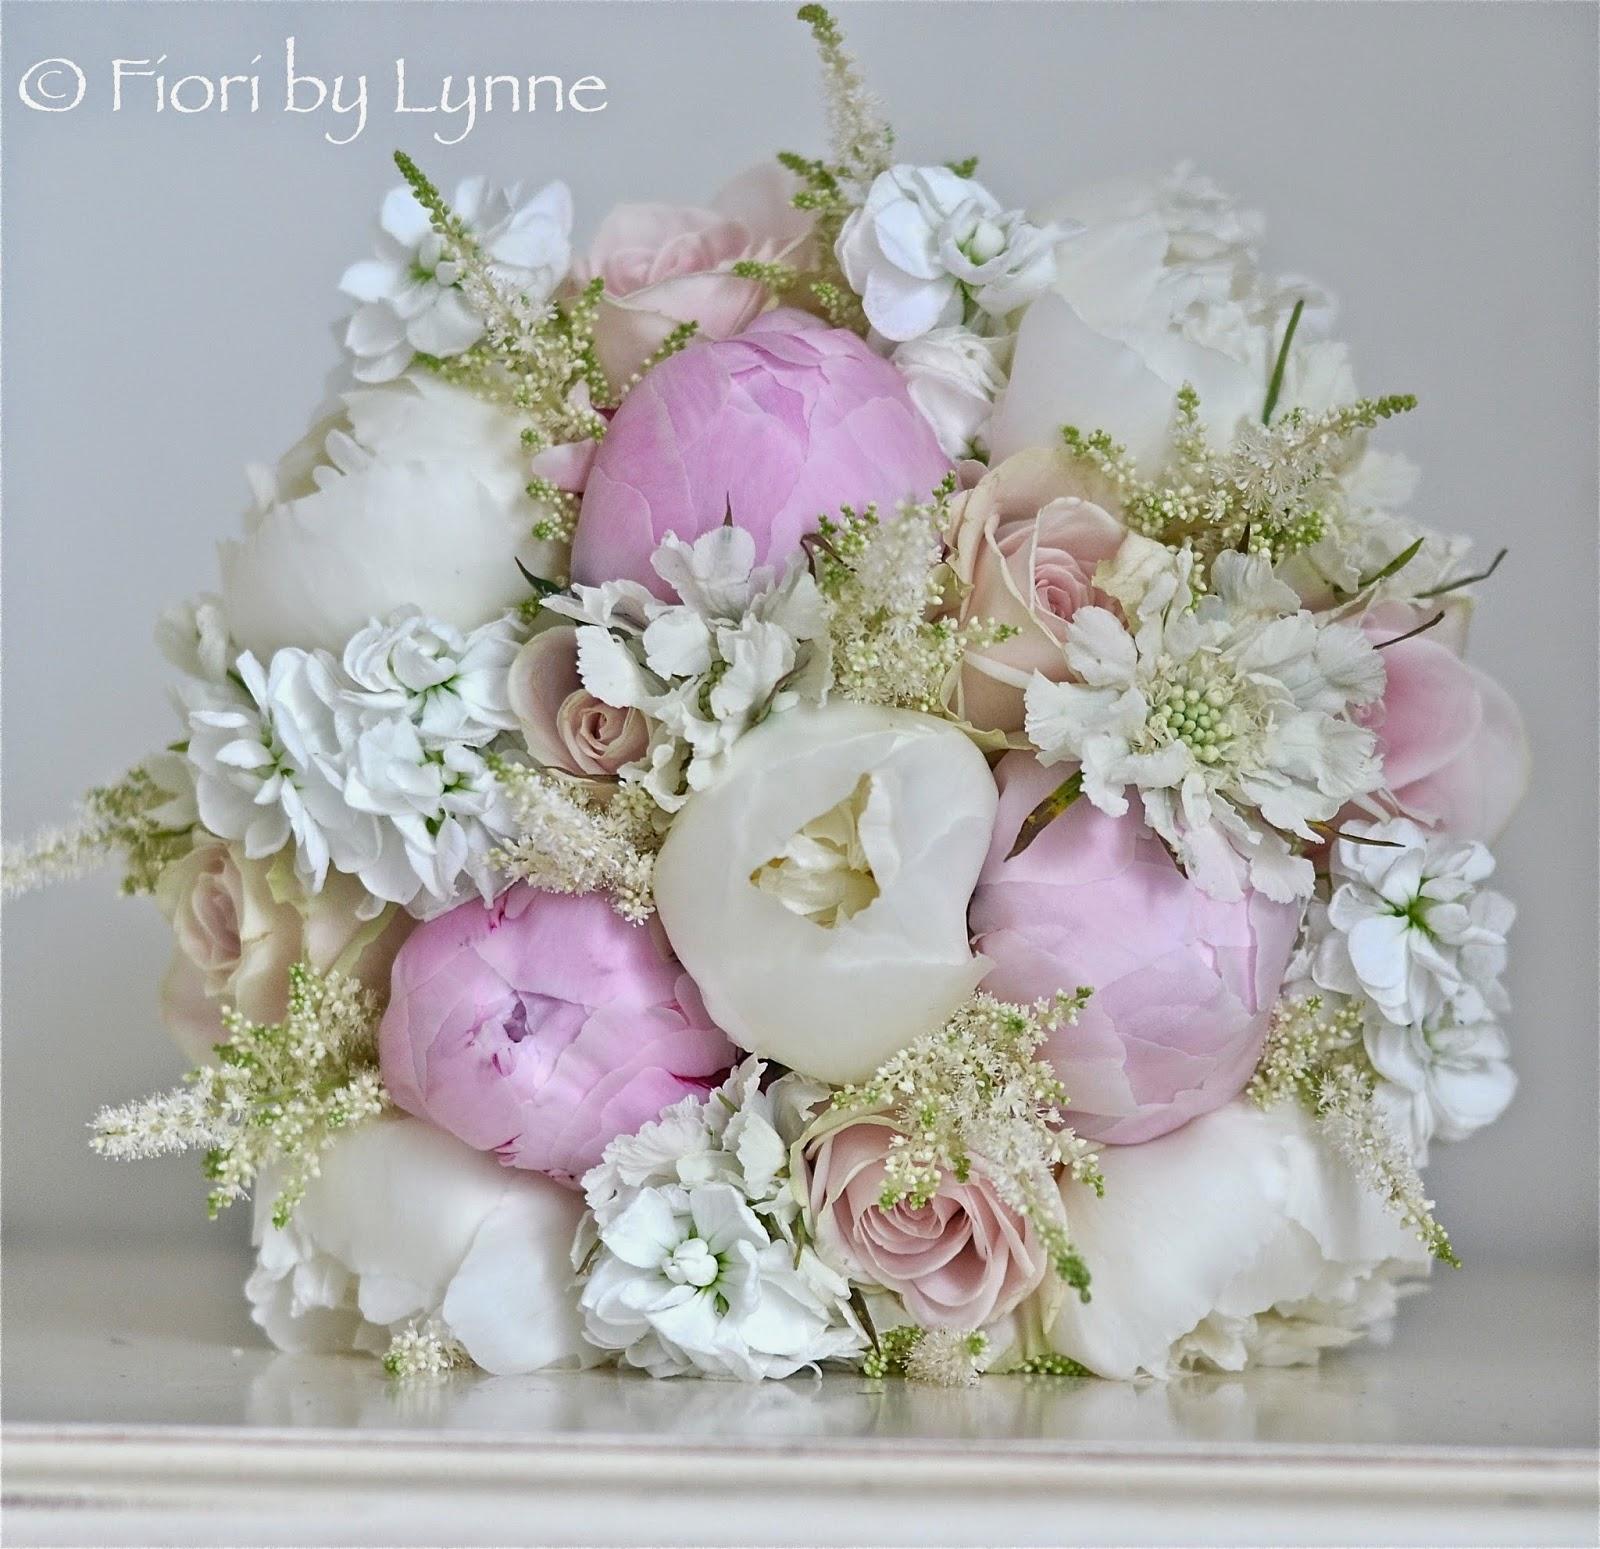 wedding flowers blog rachel 39 s romantic june wedding flowers southend barns. Black Bedroom Furniture Sets. Home Design Ideas